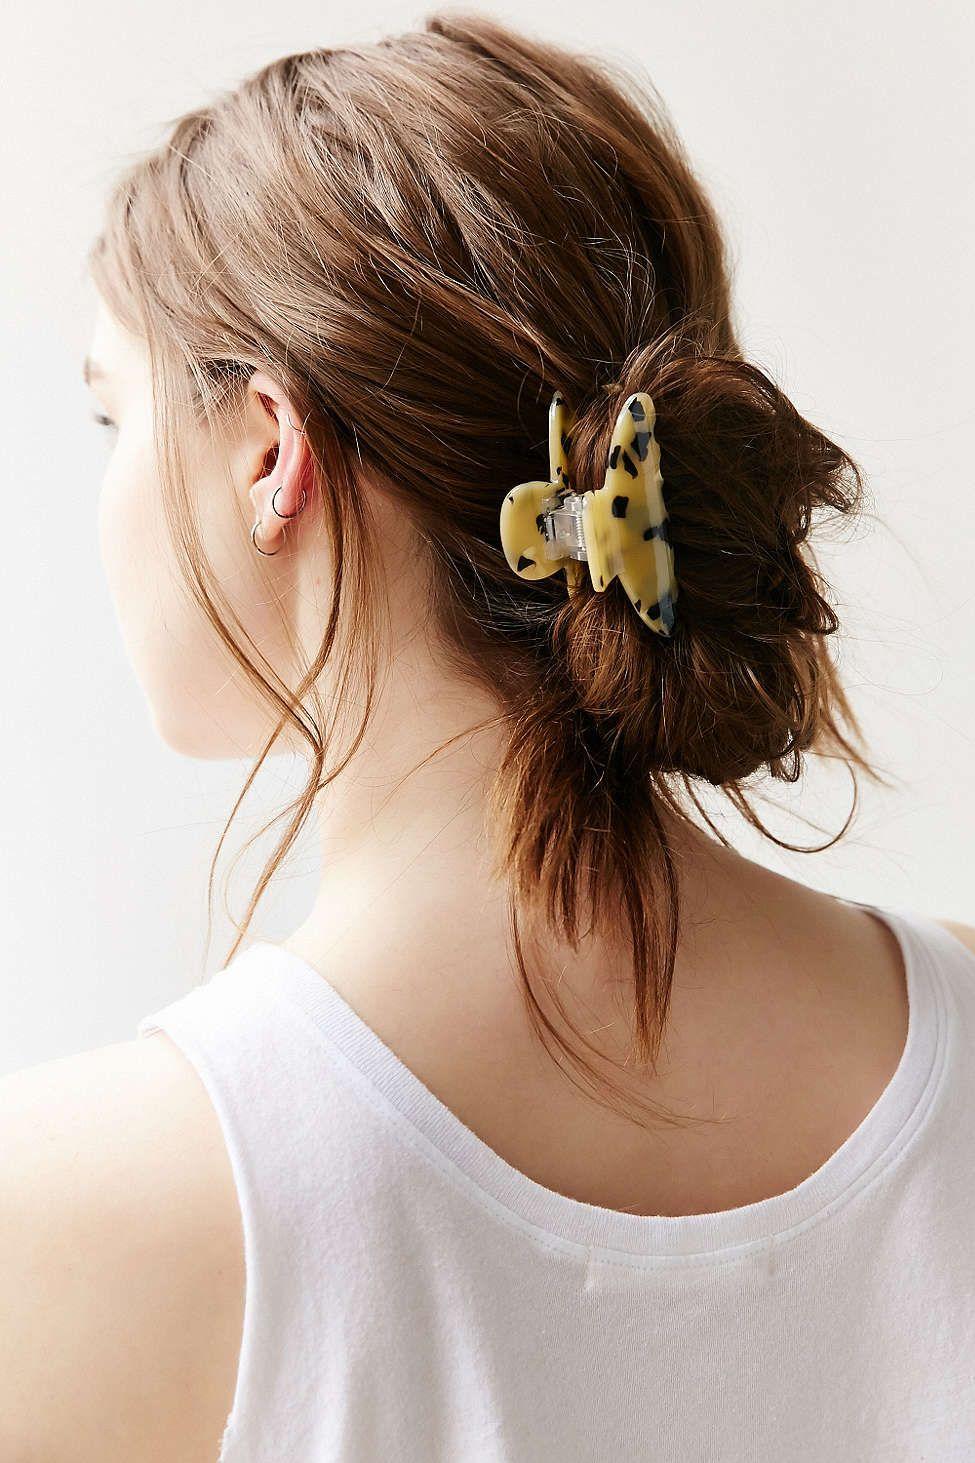 Tortoise Claw Hair Clip Clip Hairstyles Claw Hair Clips Hair Styles